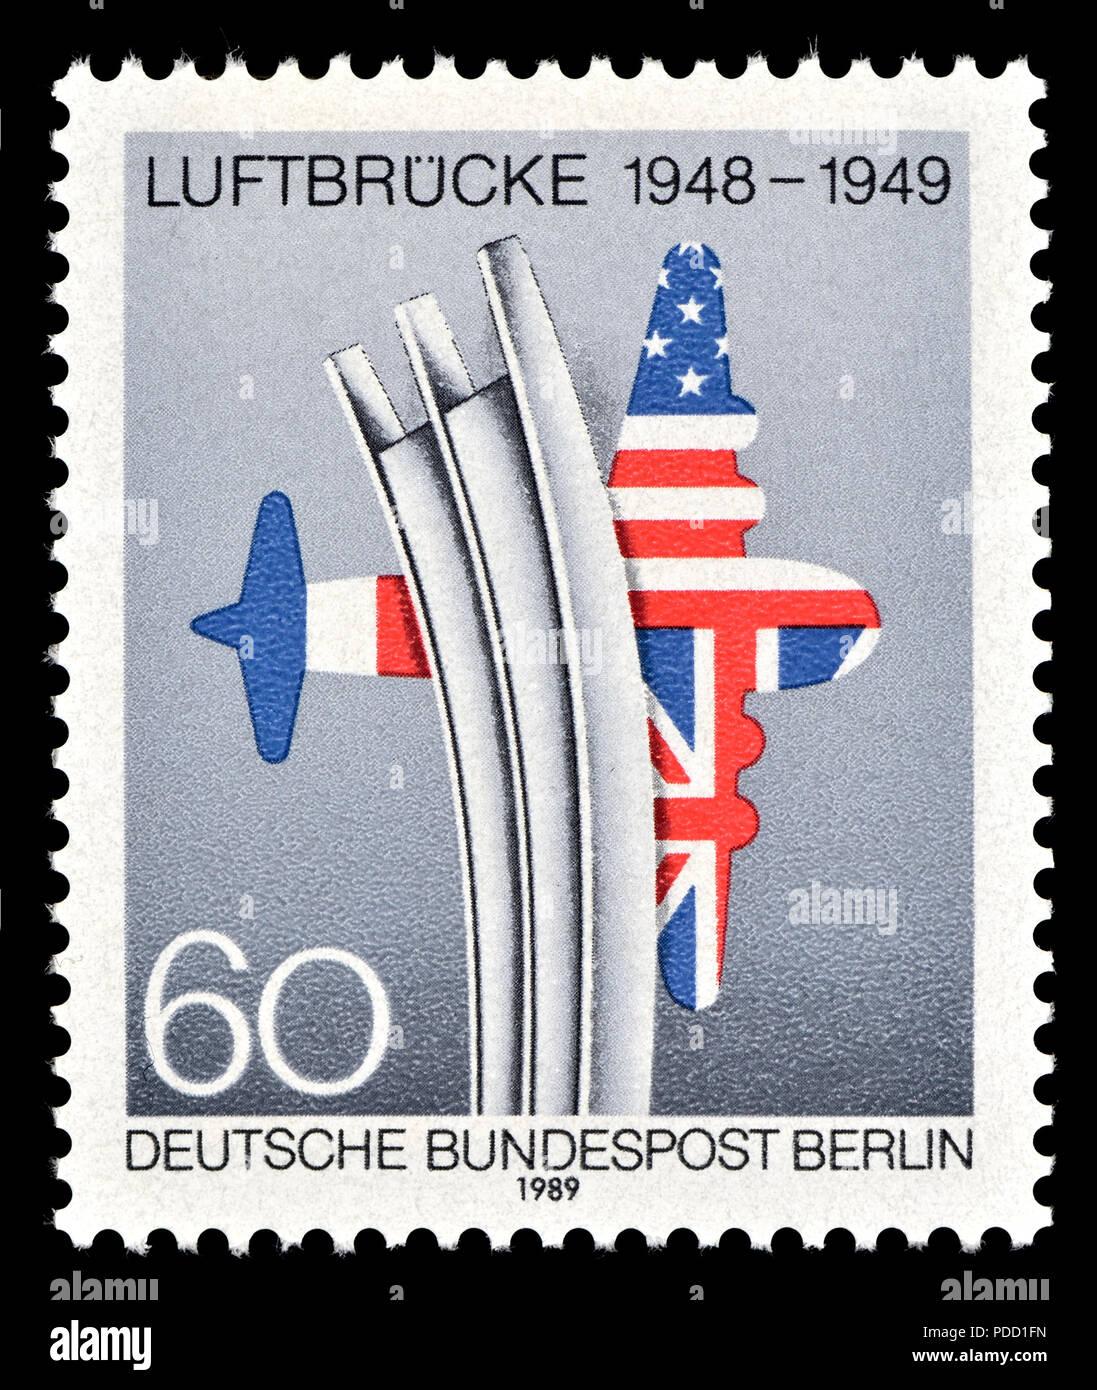 German postage stamp (Berlin: 1989) : Berlin Air Lift / Luftbrucke (1948 - 49) the supply of goods to West Berlin by air during the Berlin Blockade af - Stock Image